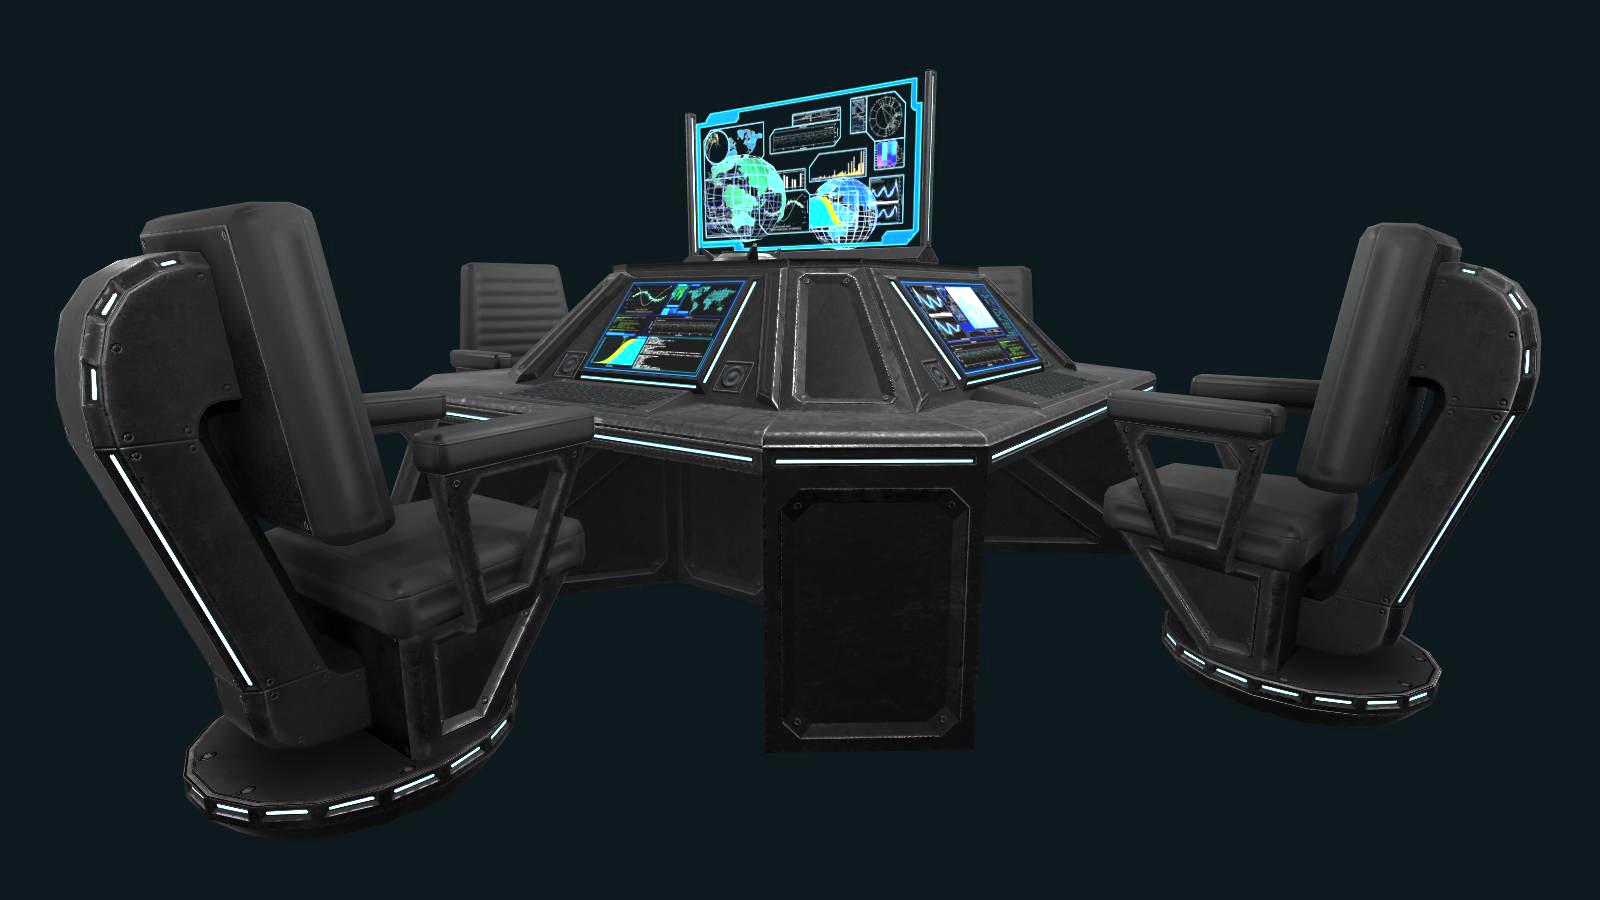 Sci-fi Communications Center